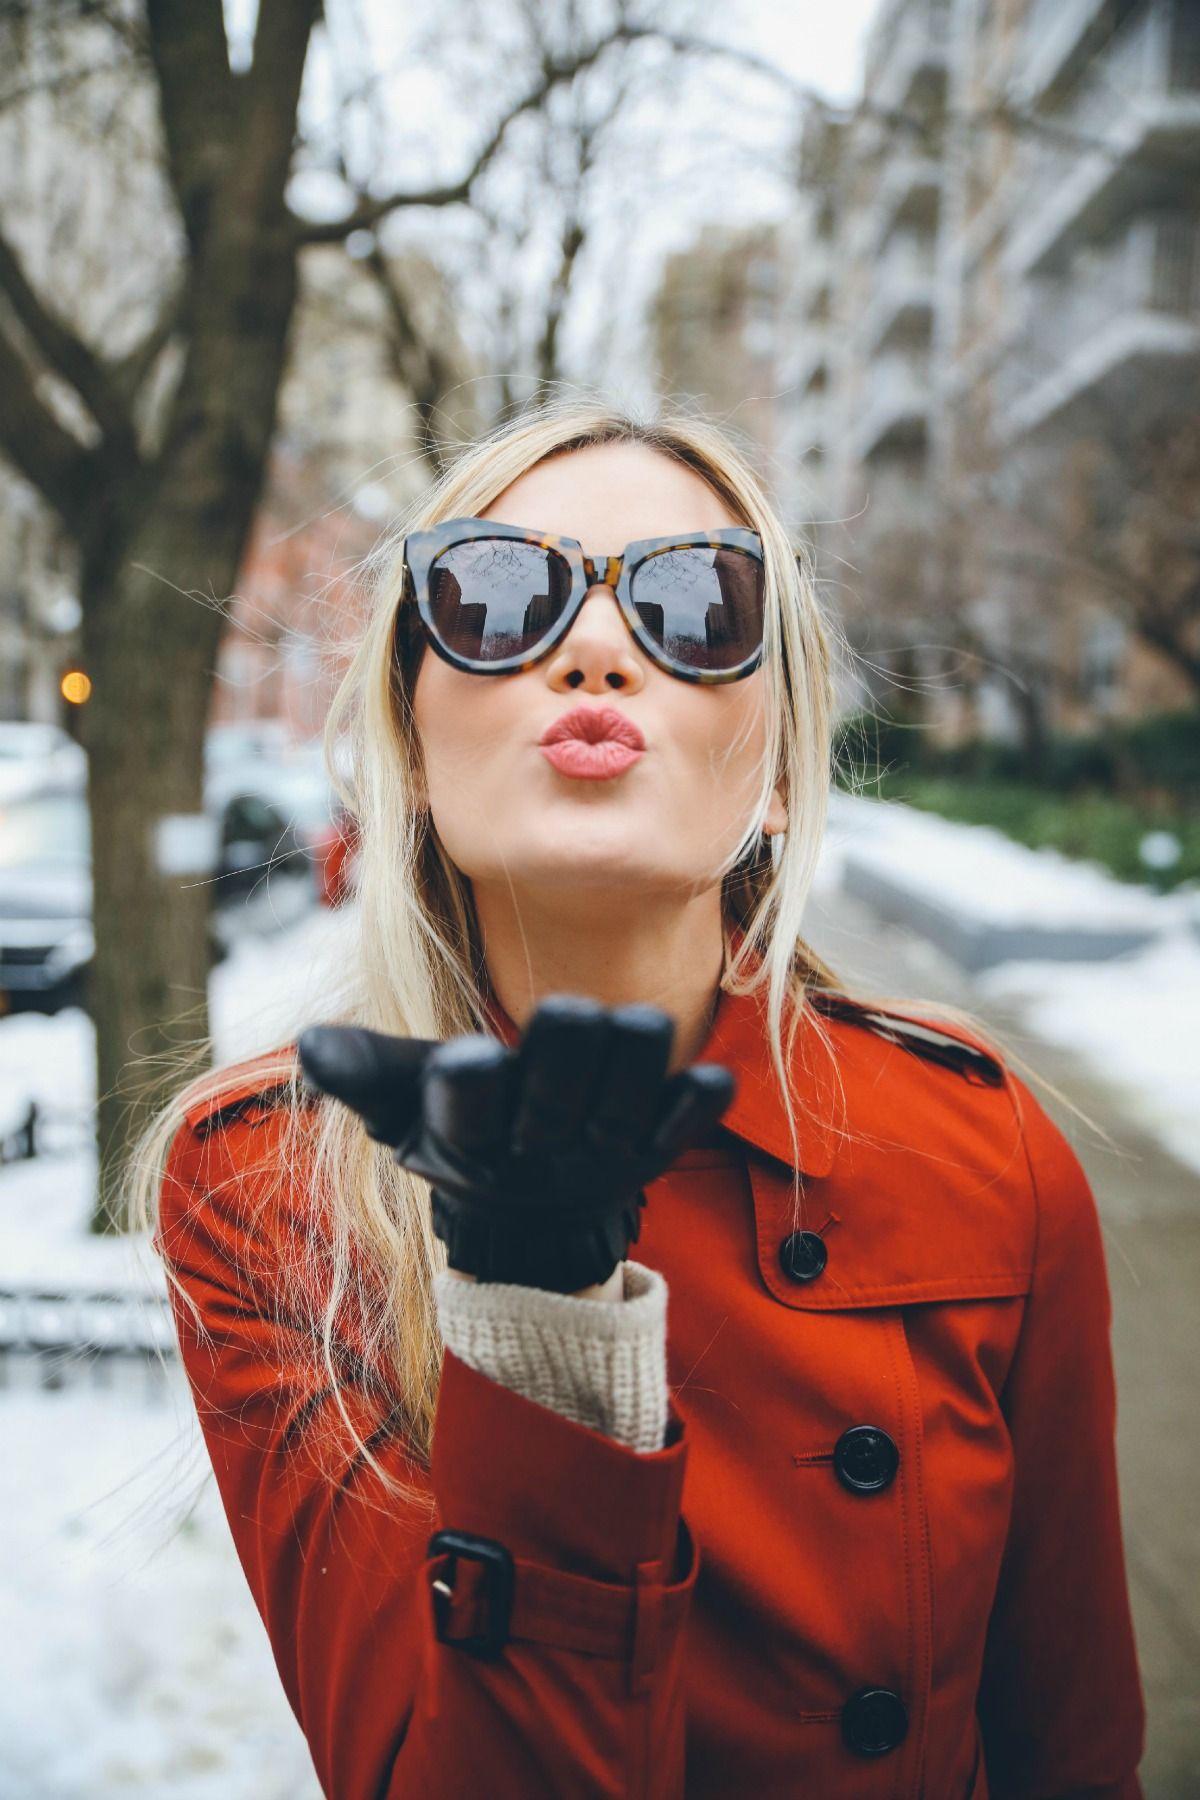 Mens leather gloves target - Lipstick Elizabeth Arden Trench Burberry Sweater Target Similar